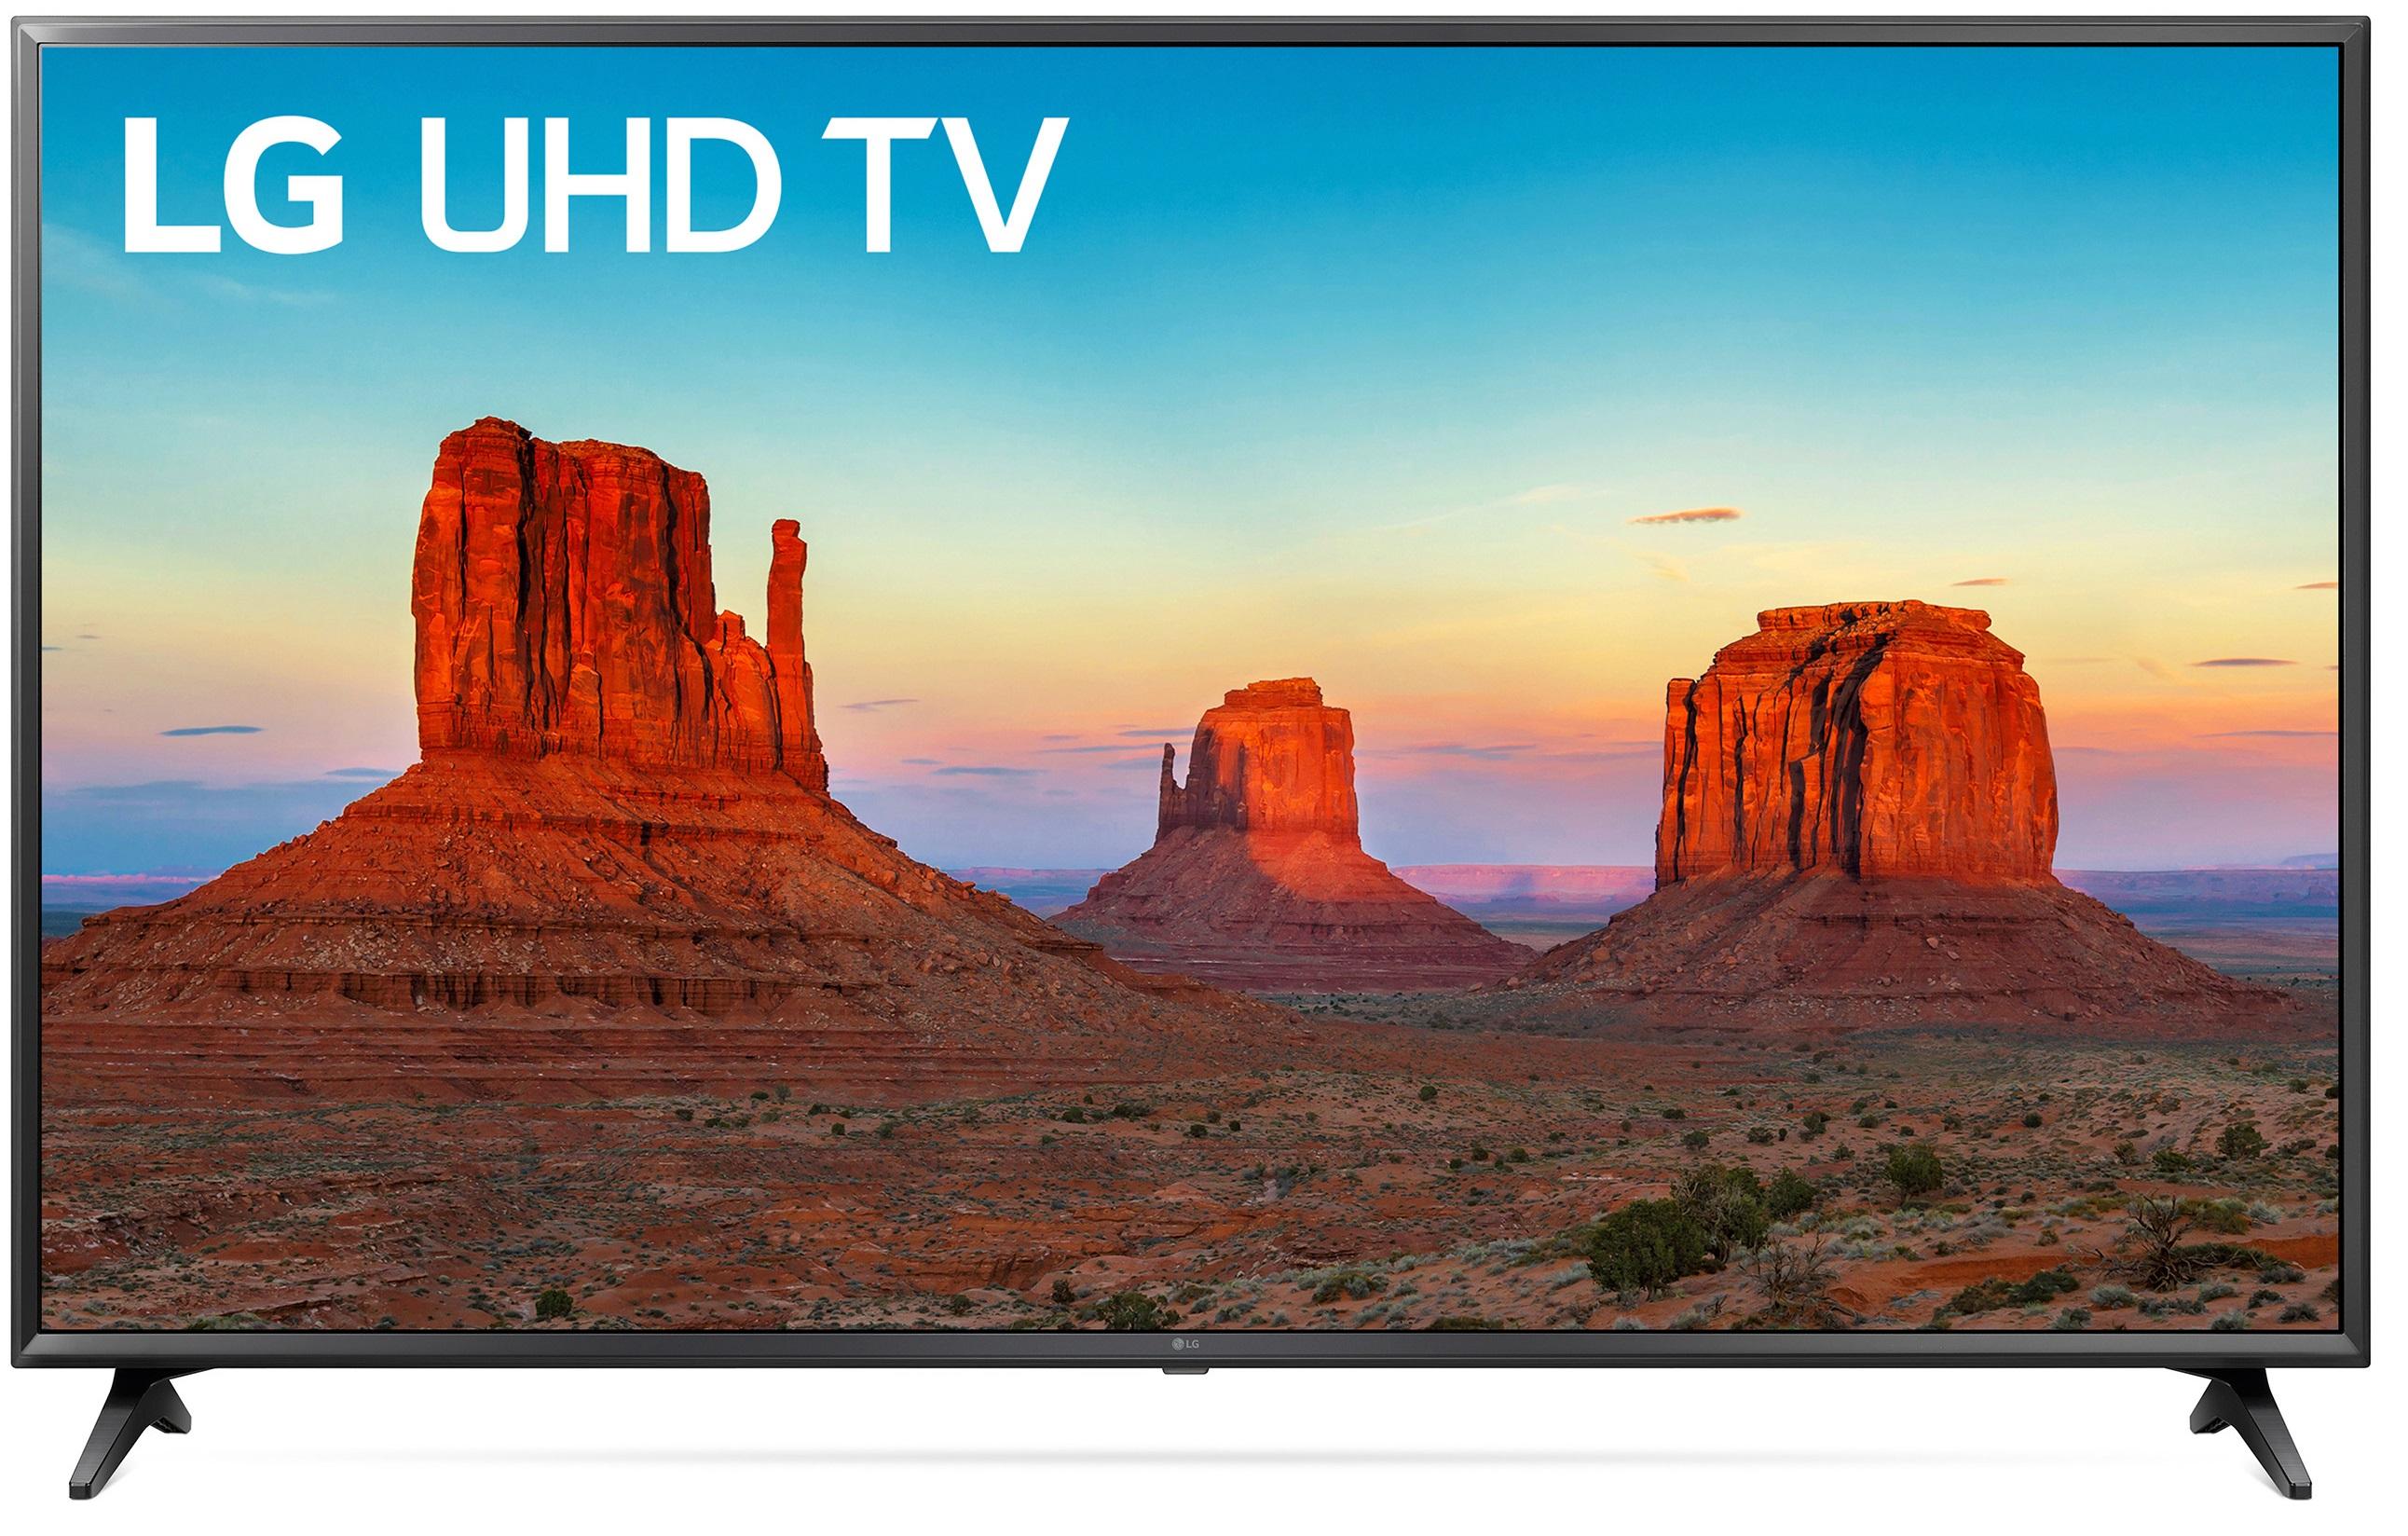 "YMMV - LG 65"" Class 4K (2160P) Ultra HD Smart LED HDR TV 65UK6200PUA $499"